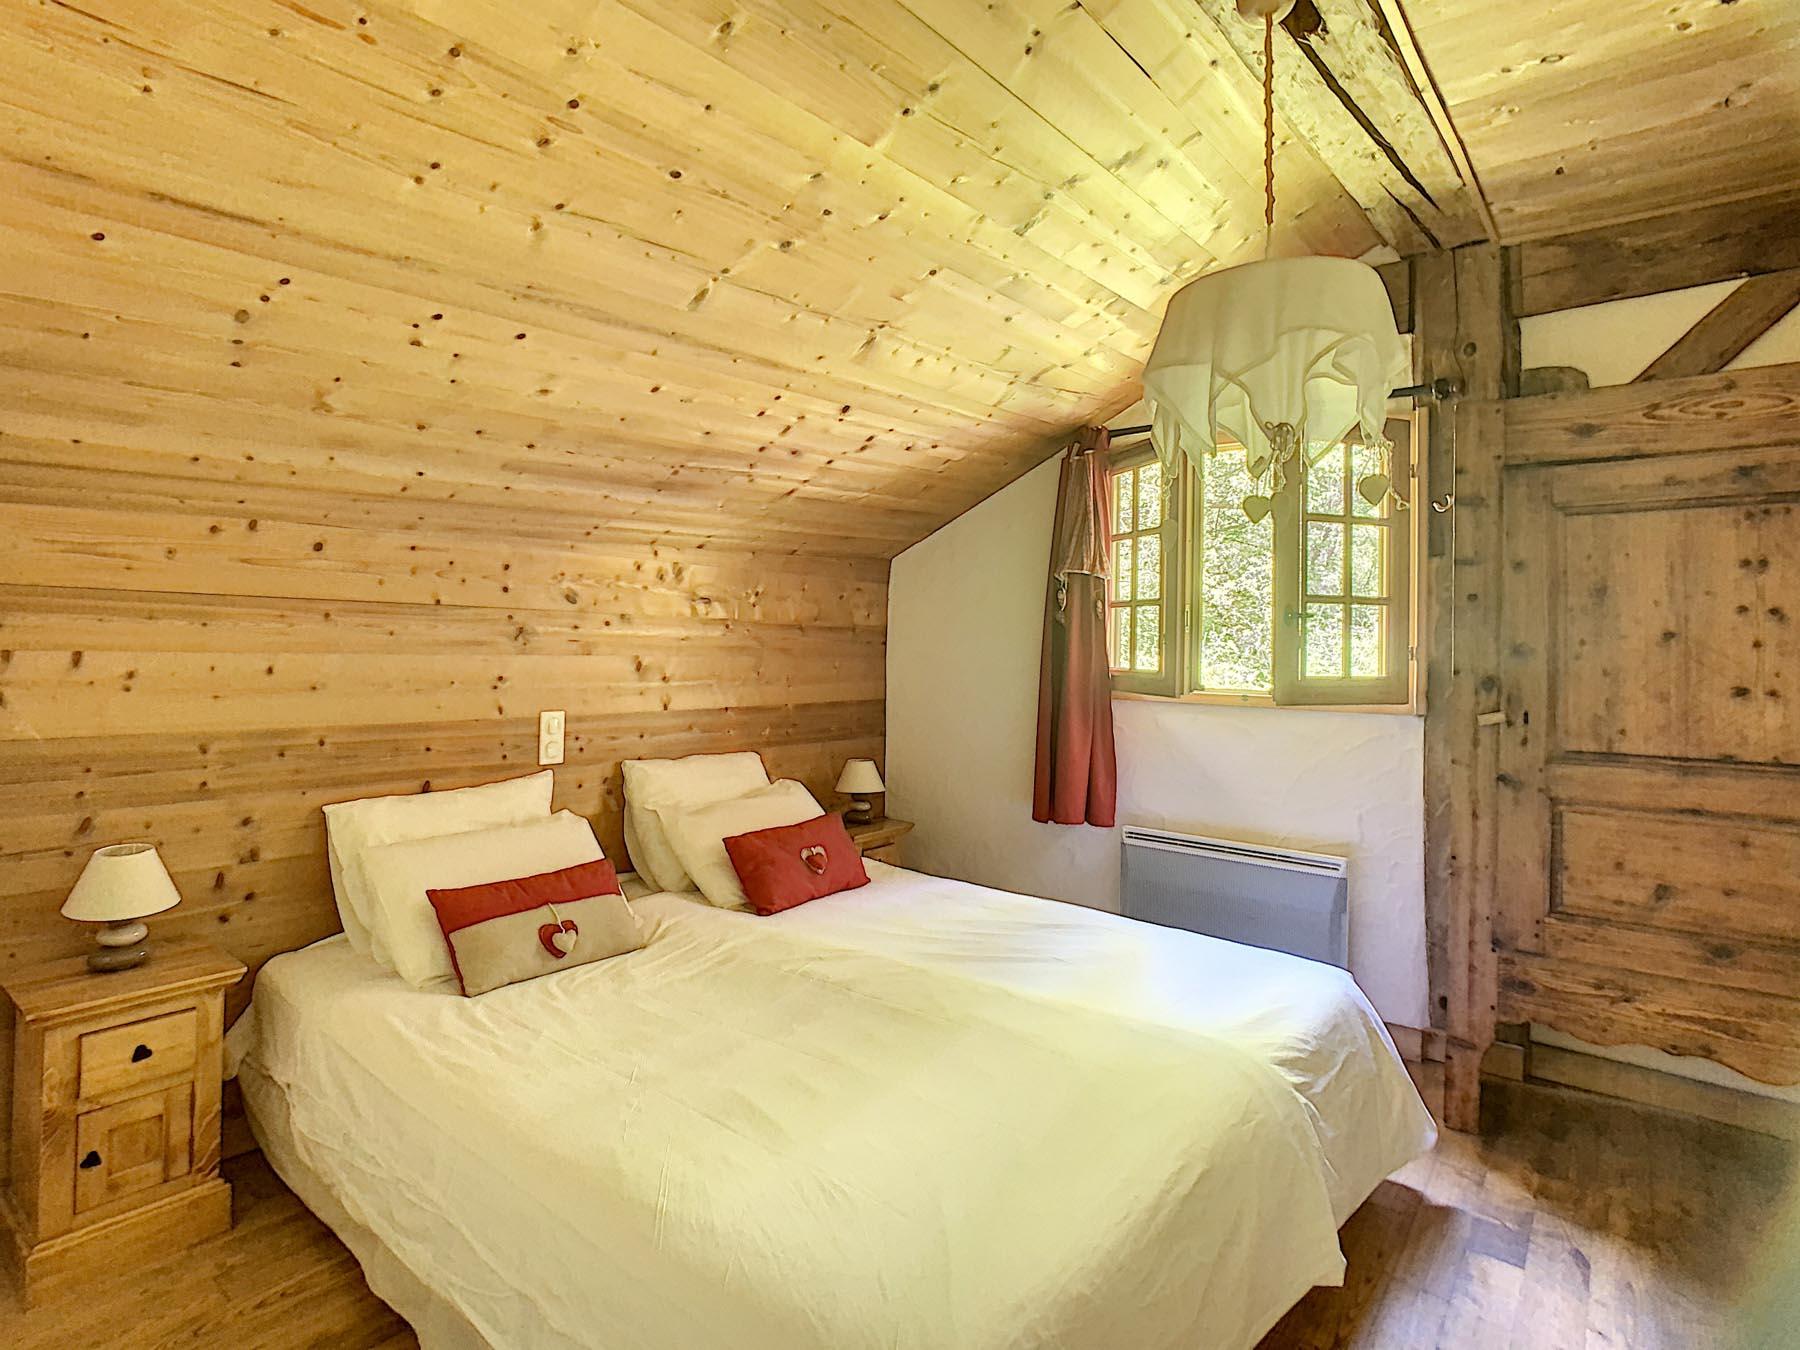 Mernaz 1160 Penthouse bedroom